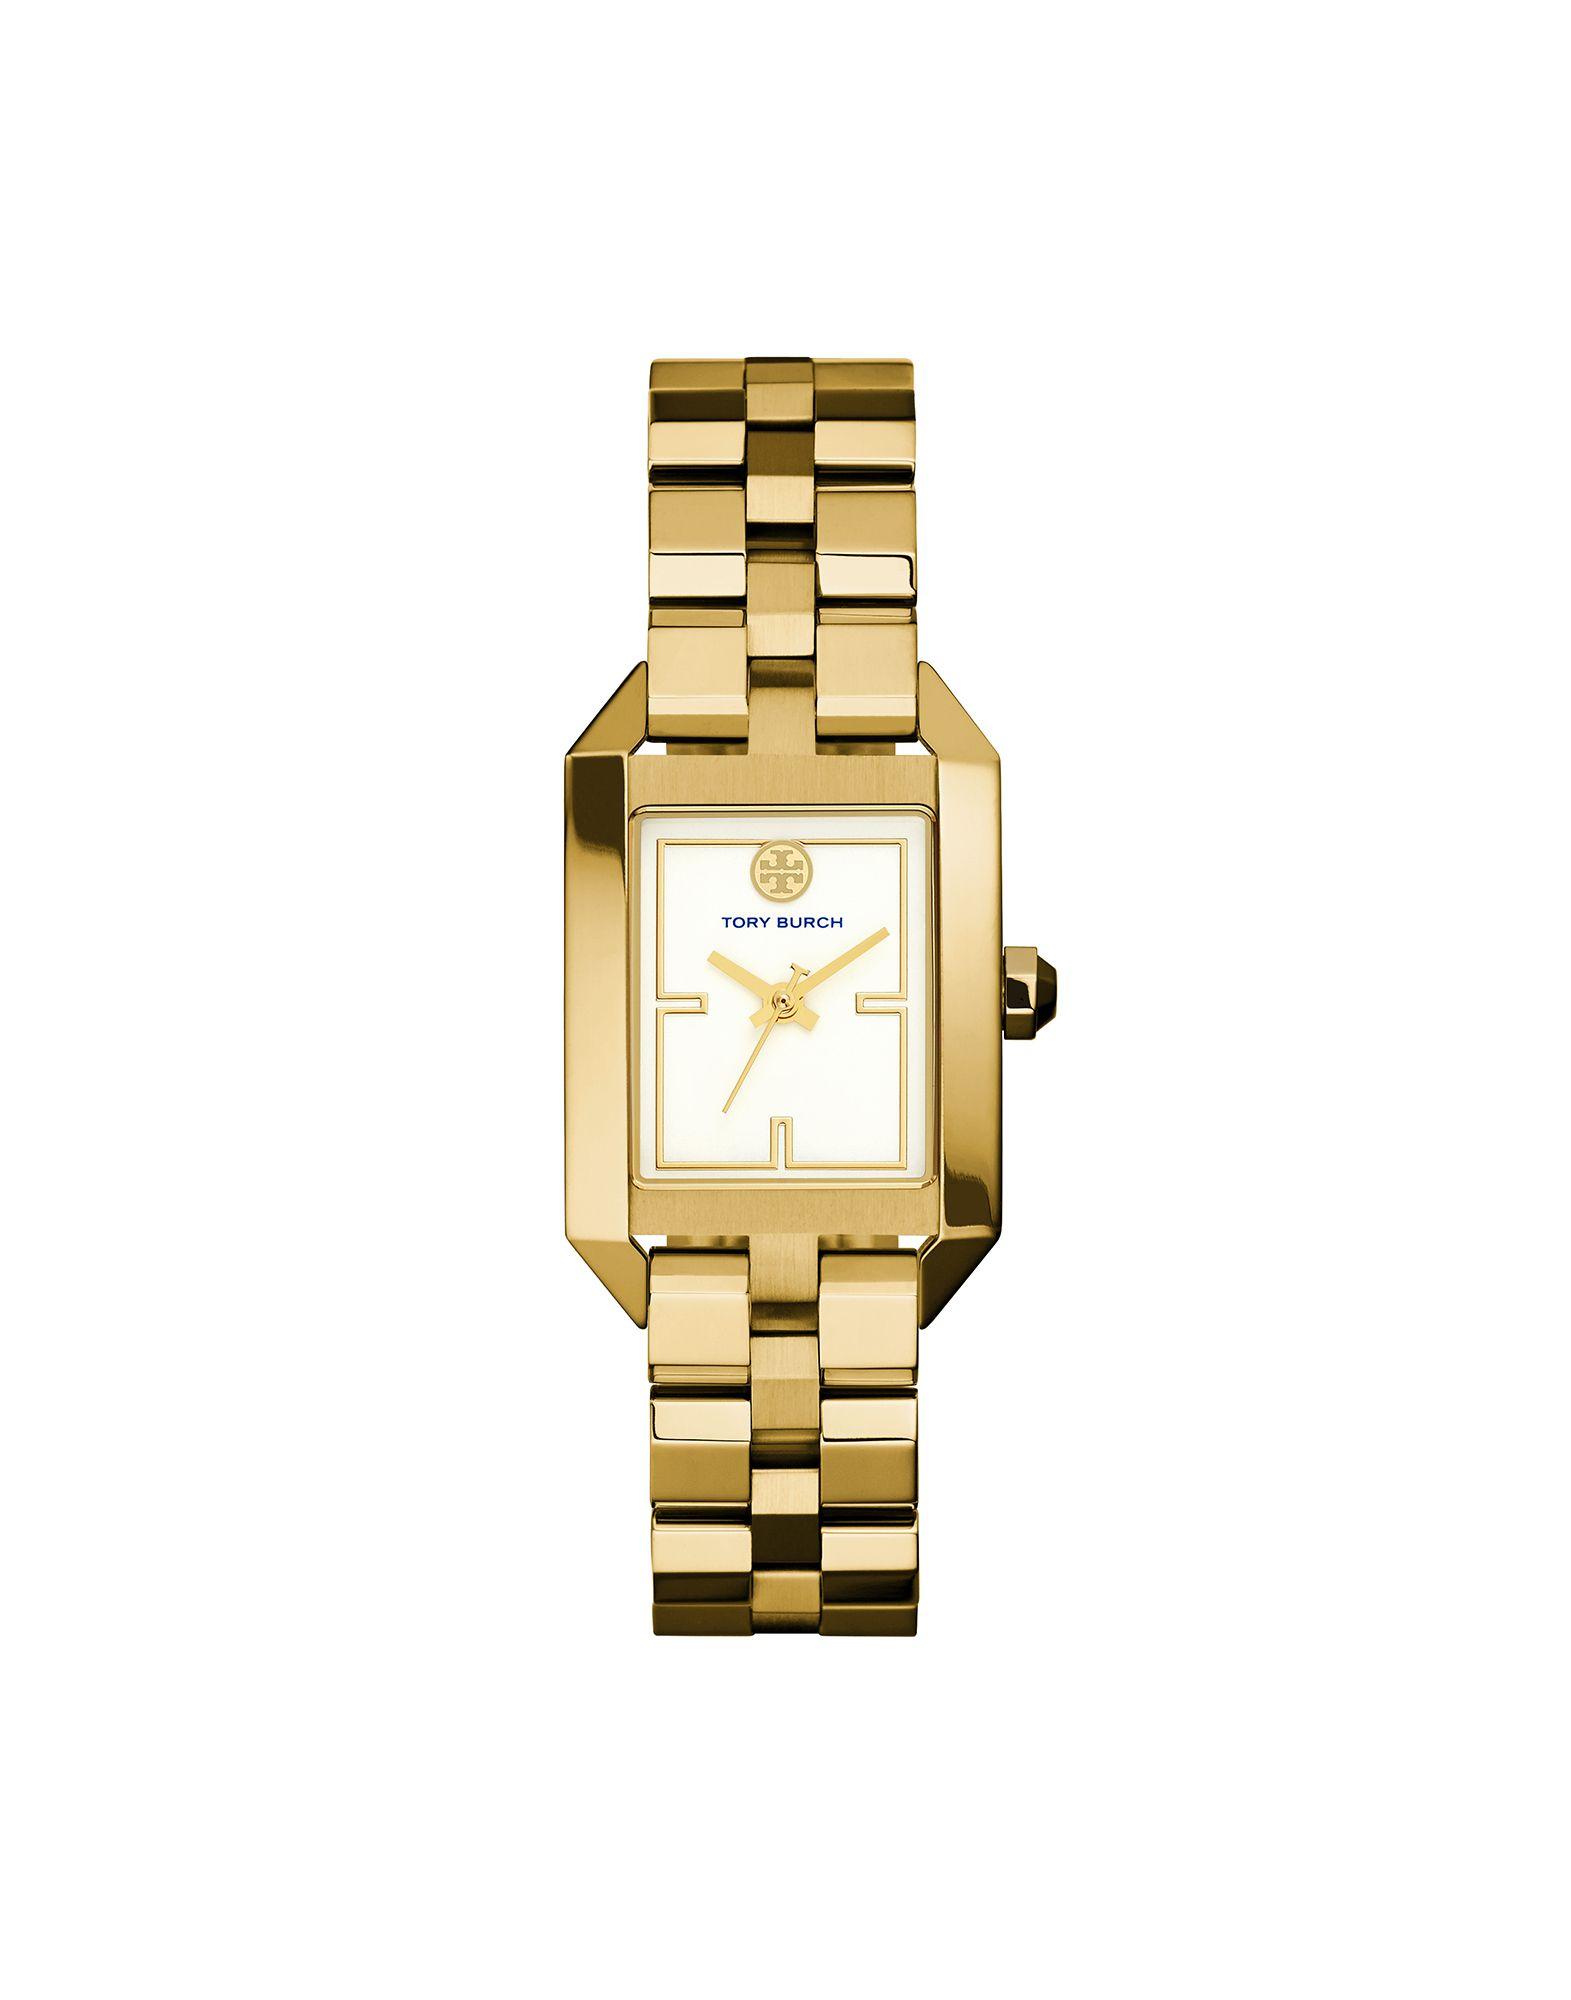 TORY BURCH Damen Armbanduhr Farbe Gold Größe 1 - broschei